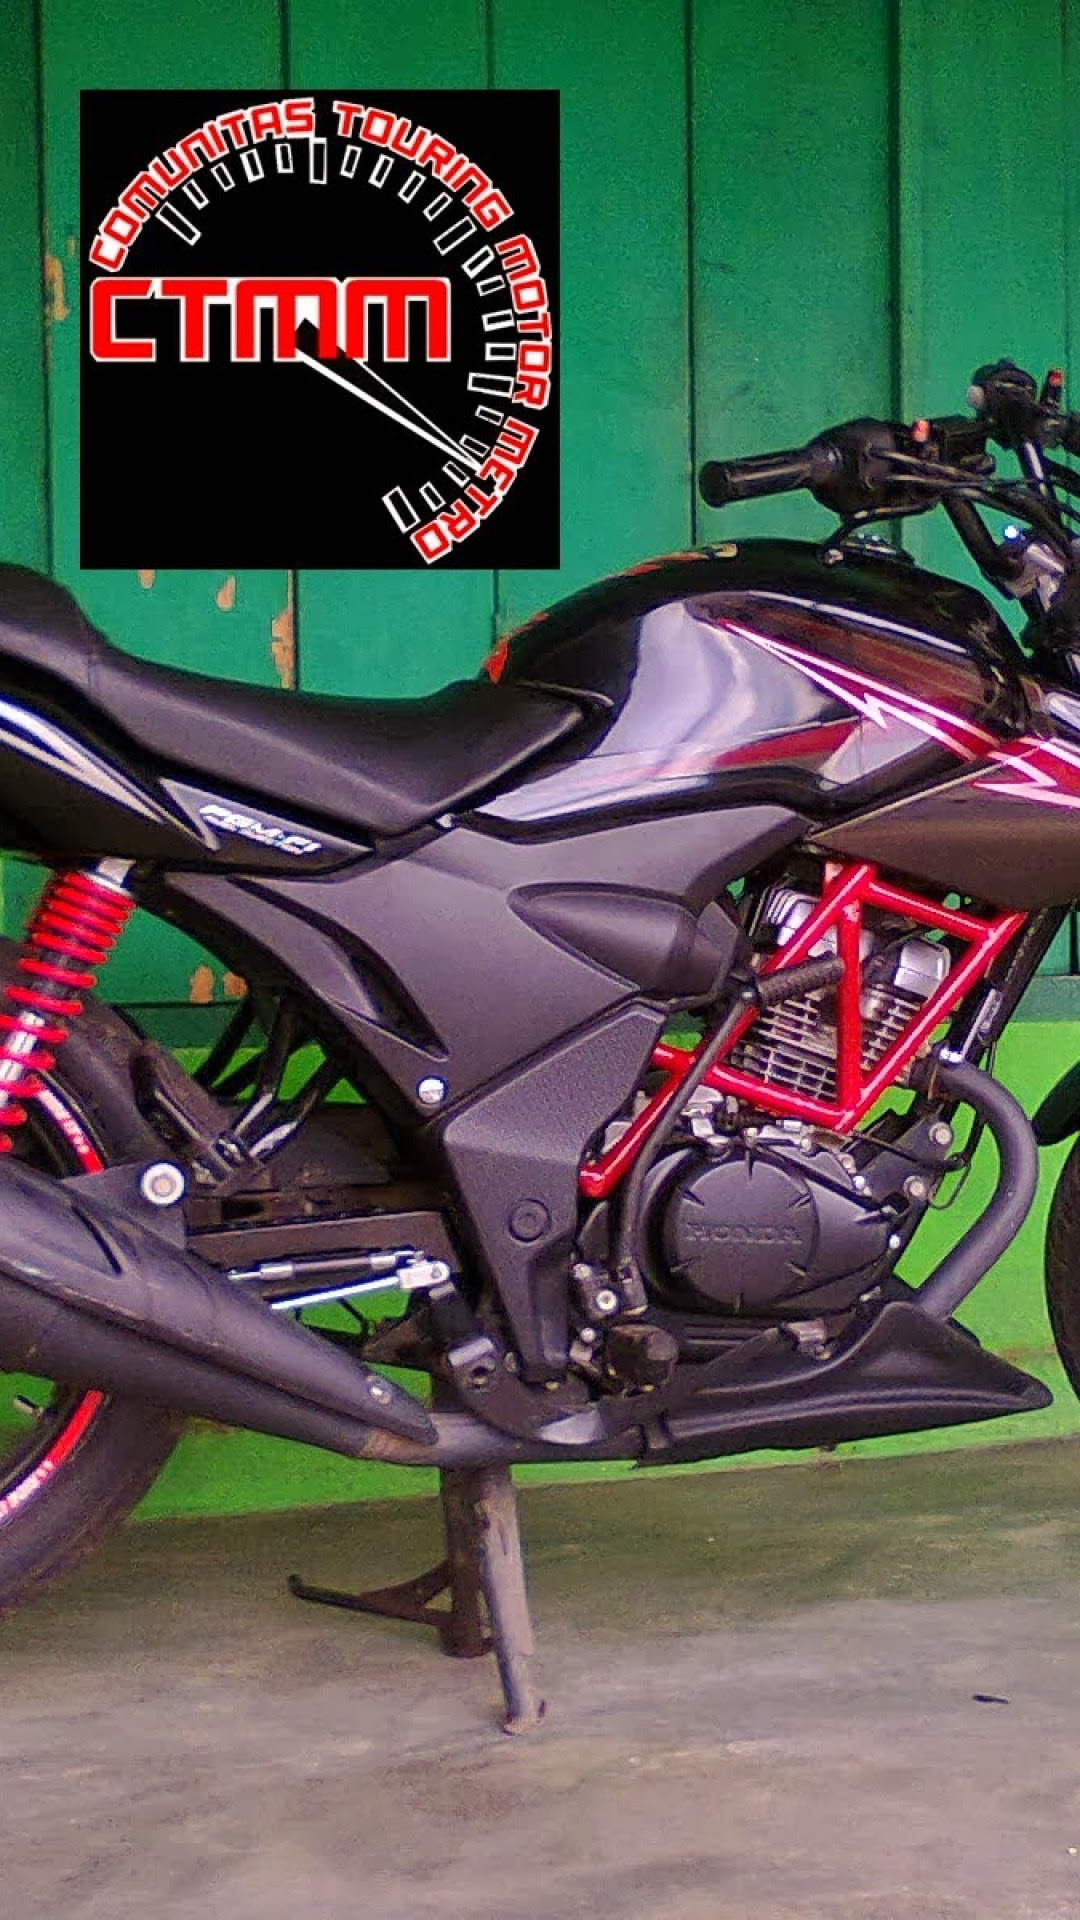 Modif Honda Verza Velg Jari Jari : modif, honda, verza, Kumpulan, Modifikasi, Motor, Honda, Verza, Terbaru, Kurawa